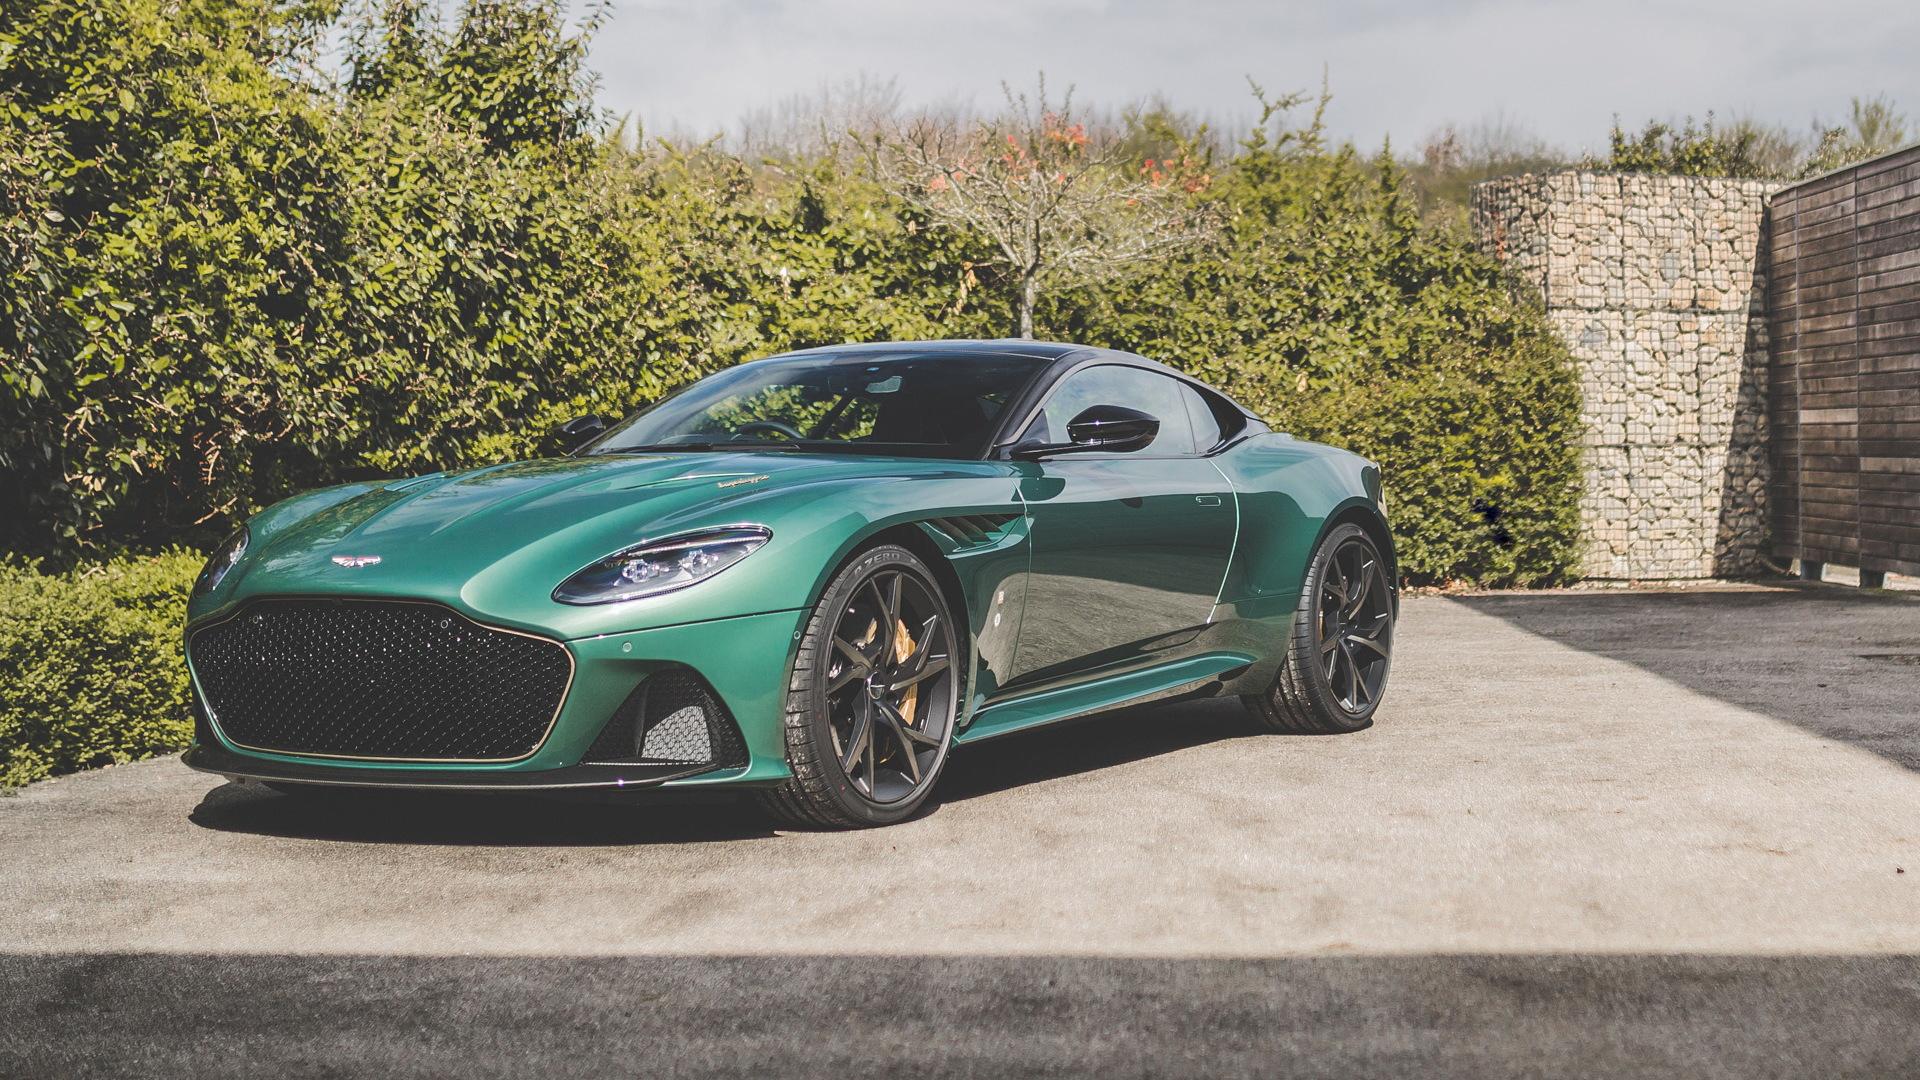 2019 Aston Martin DBS 59